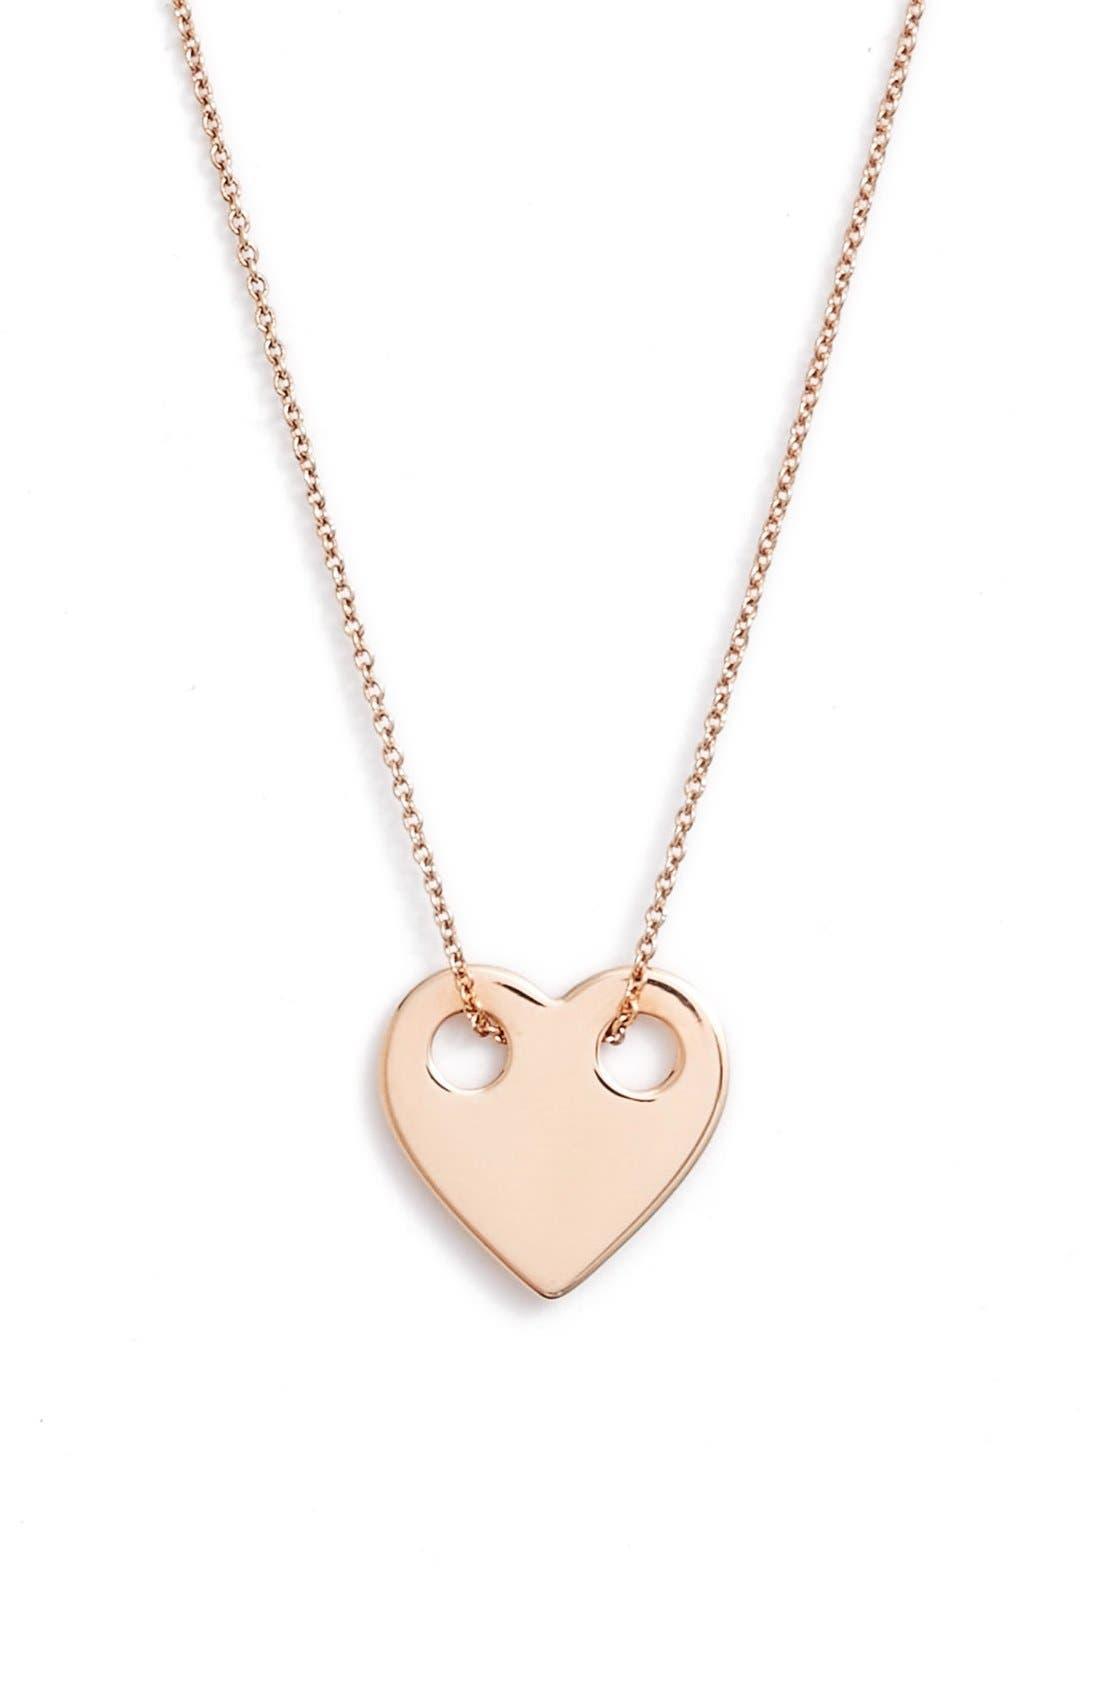 Main Image - ginette ny Mini Heart Pendant Necklace